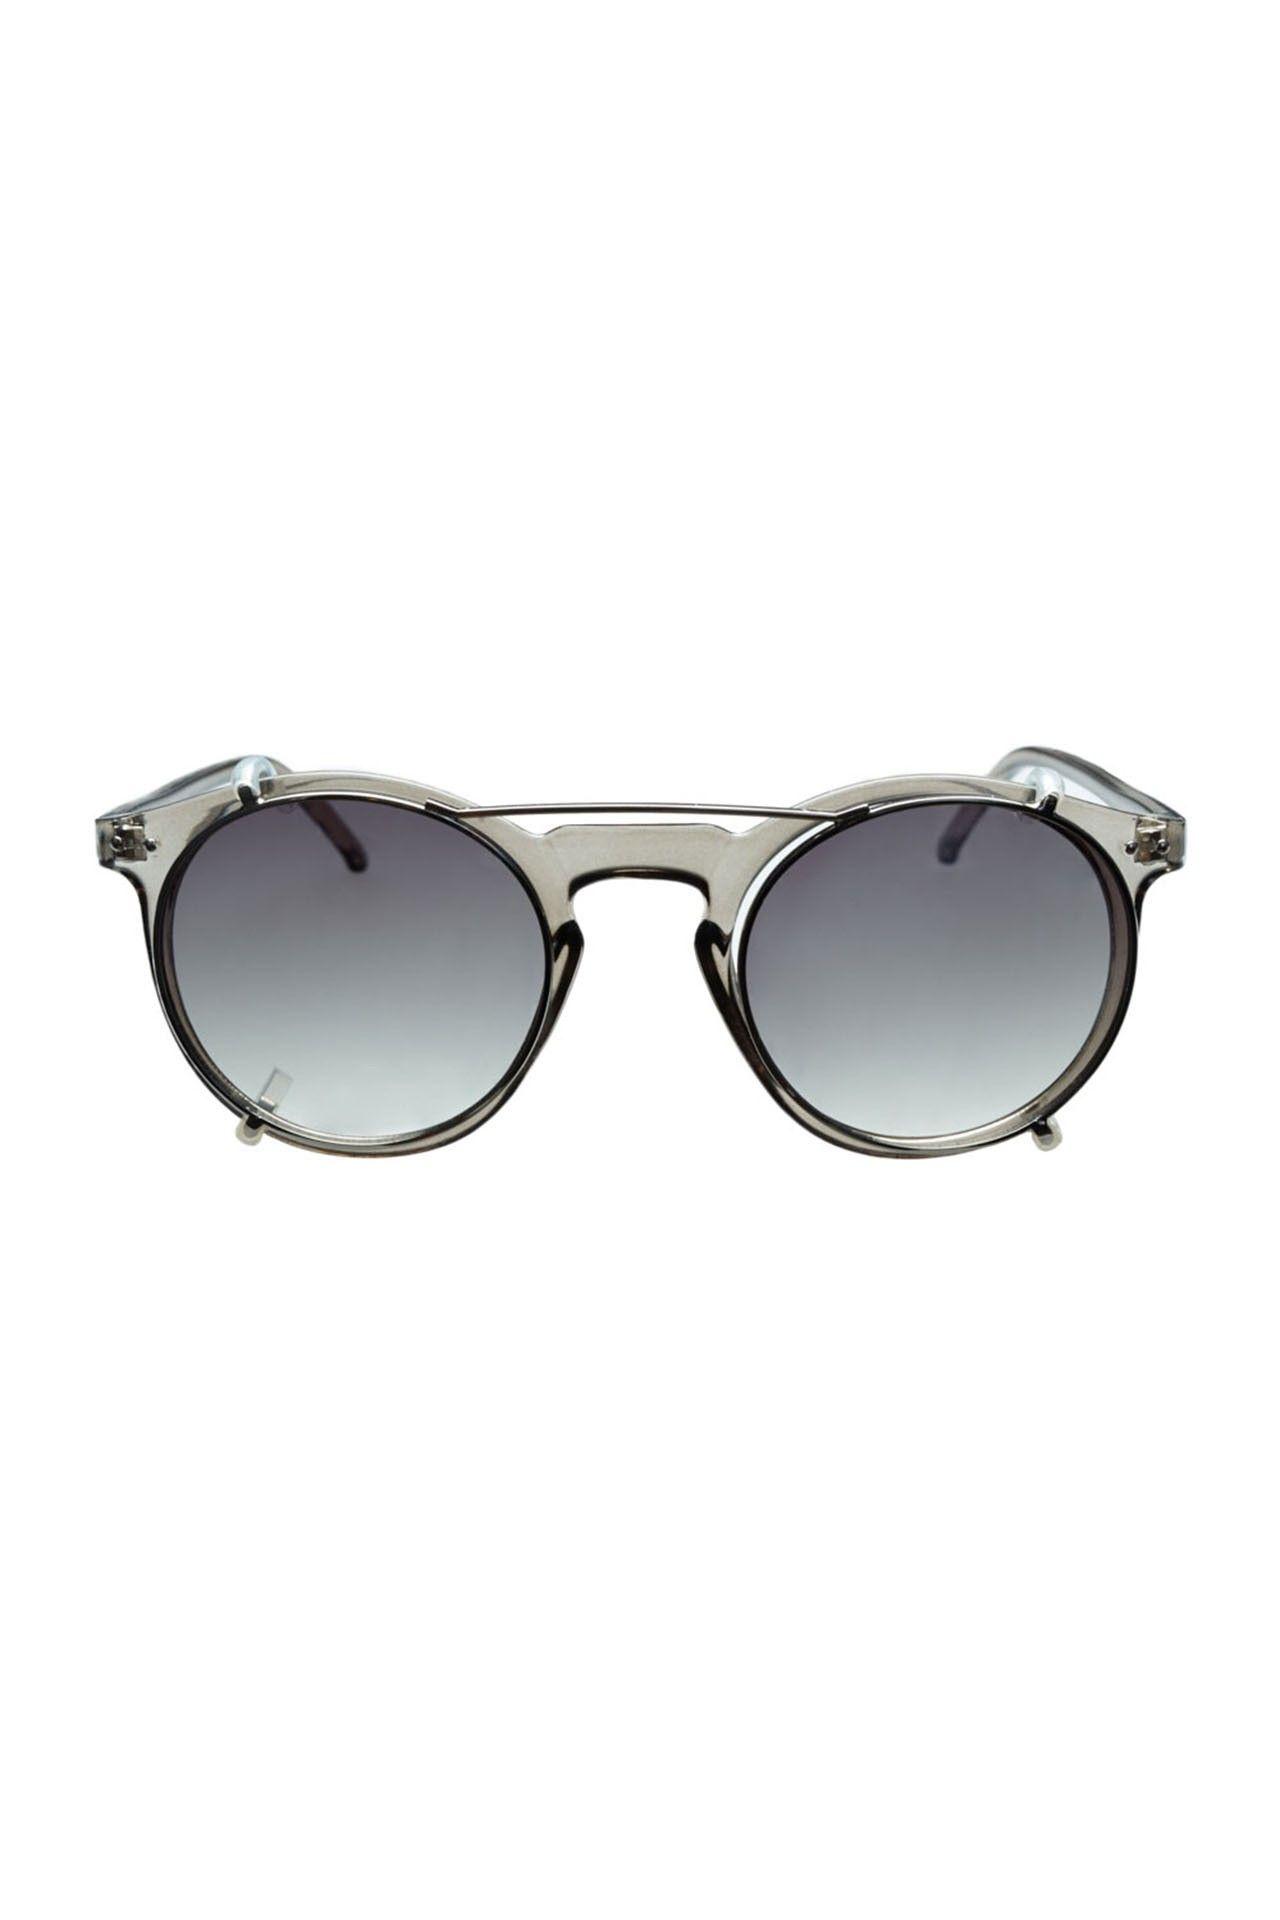 Afbeelding van Icon Eyewear Zonnebril M180921 Dark Clear Grey- Clear C